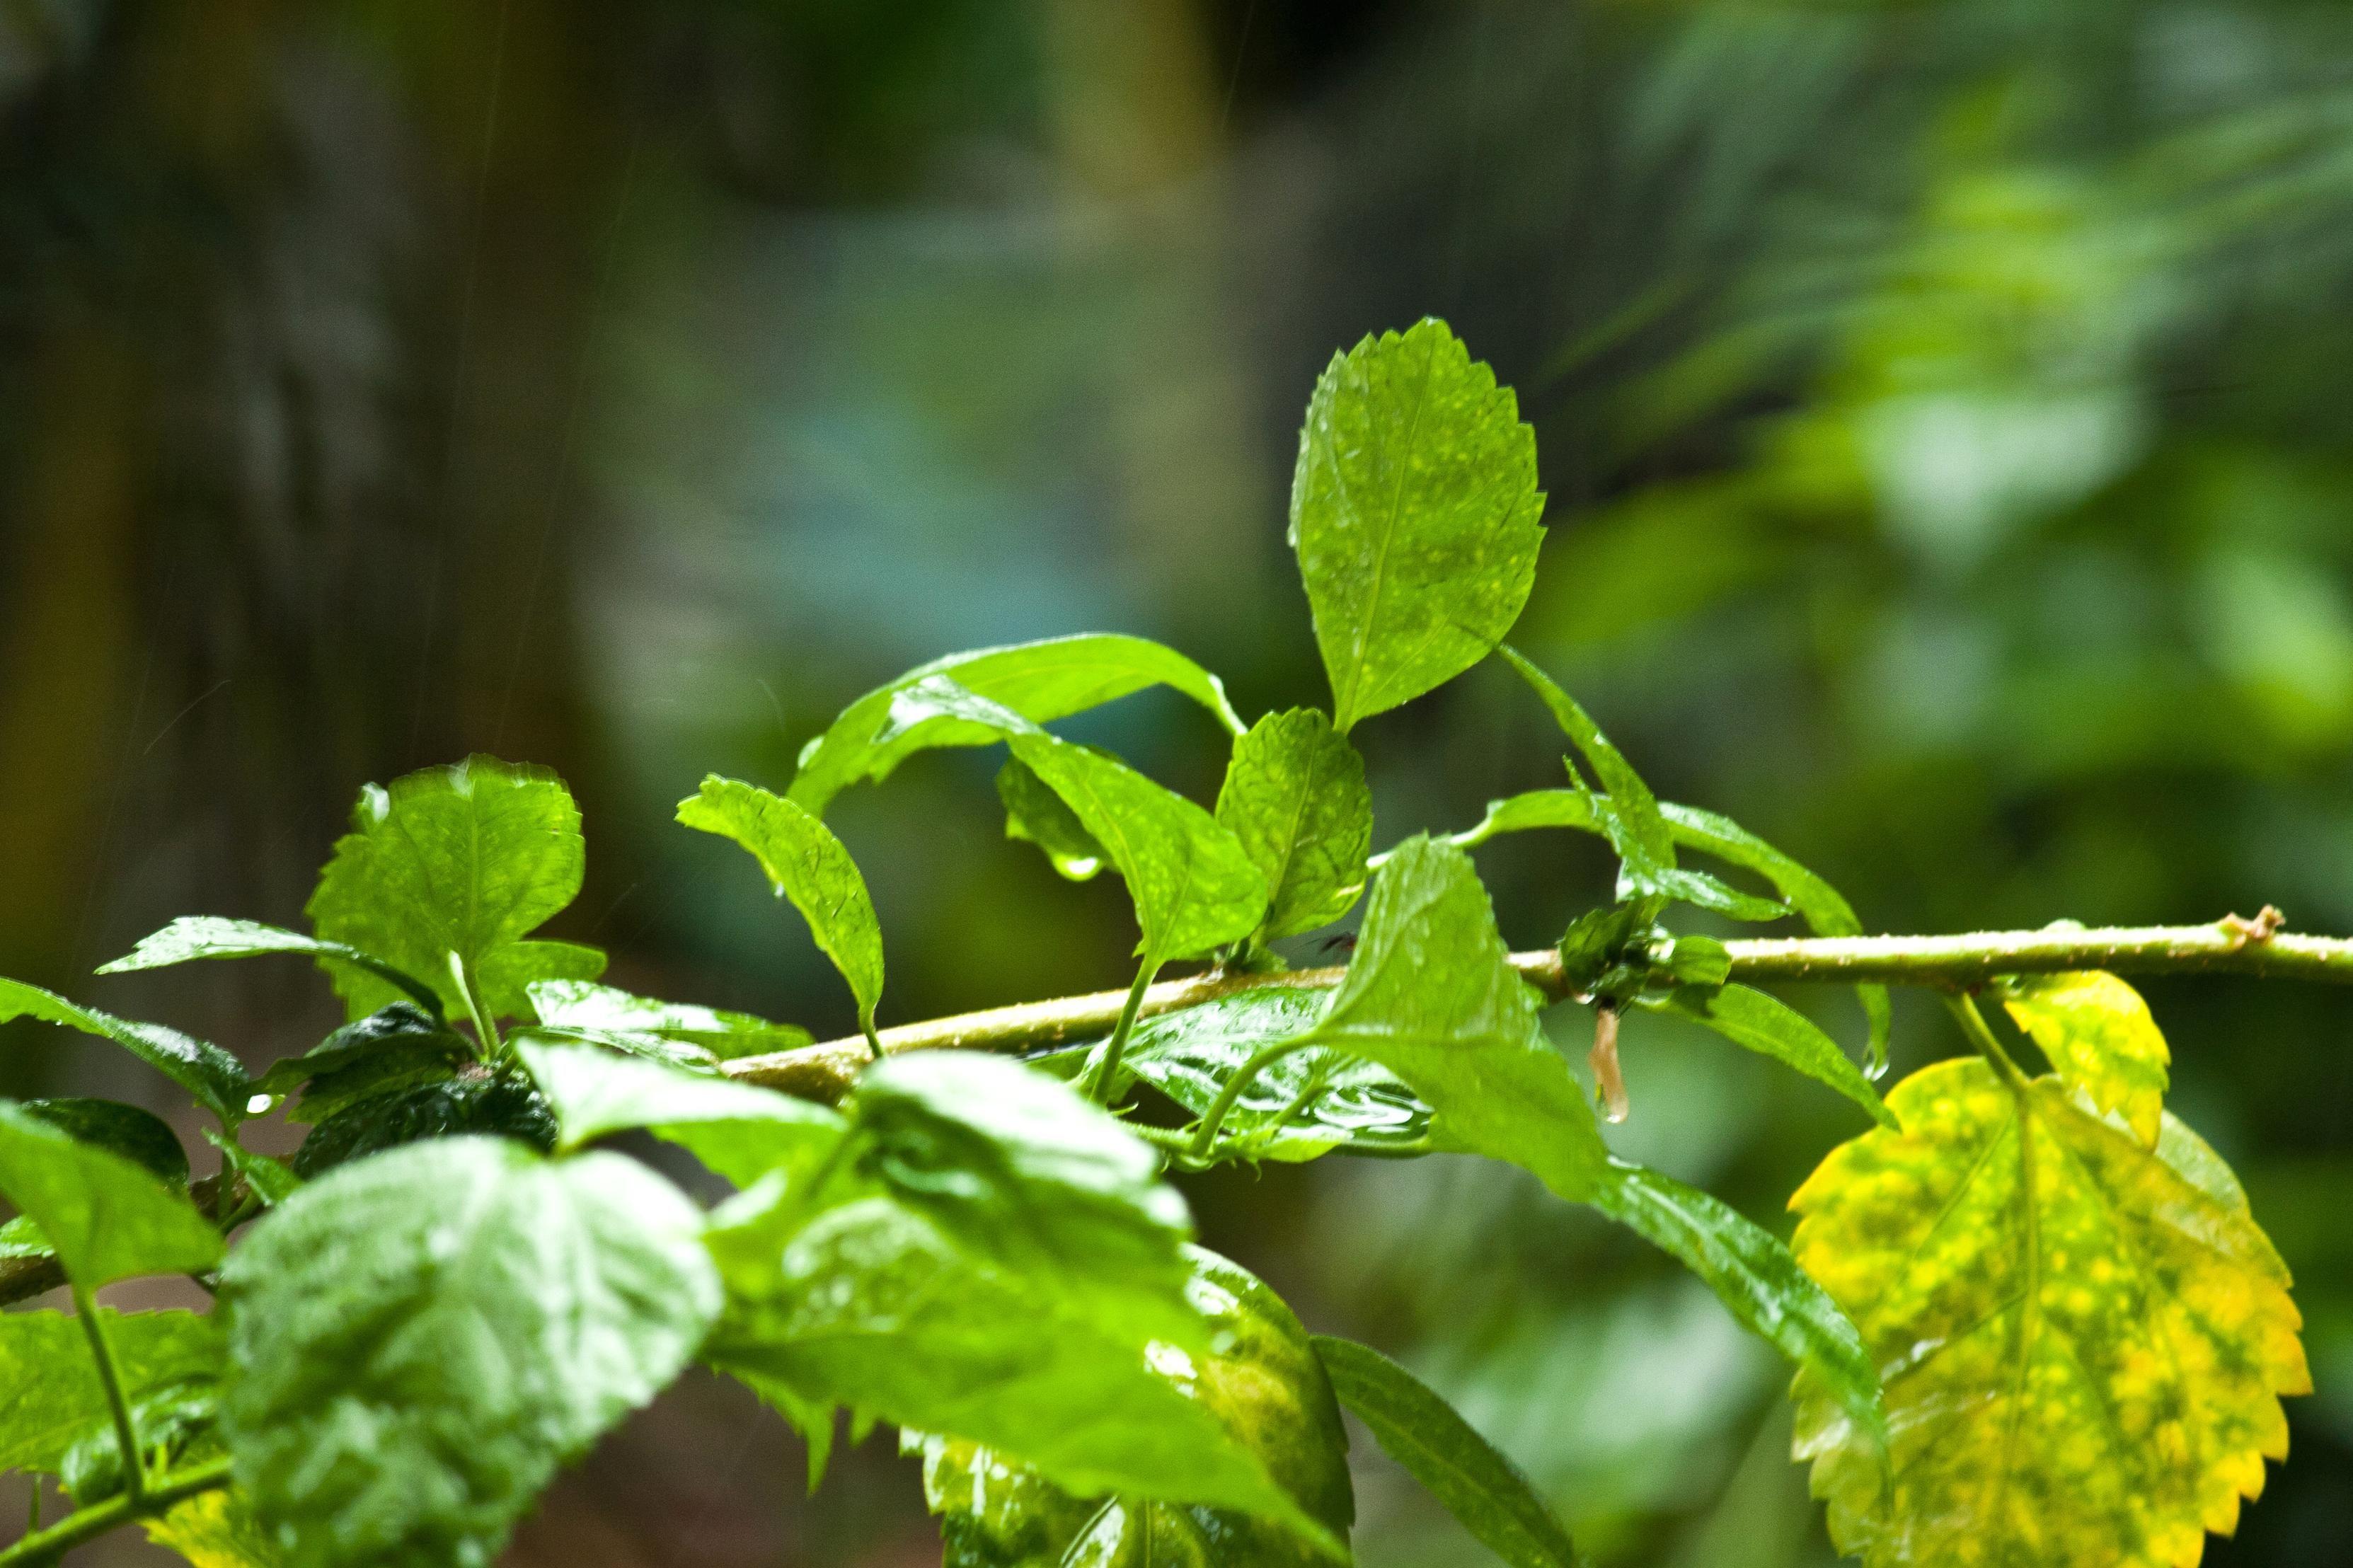 Blickfang Grüne Pflanzen Das Beste Von Pflanze, Blatt, Grüne Blätter, Zweig, Detail